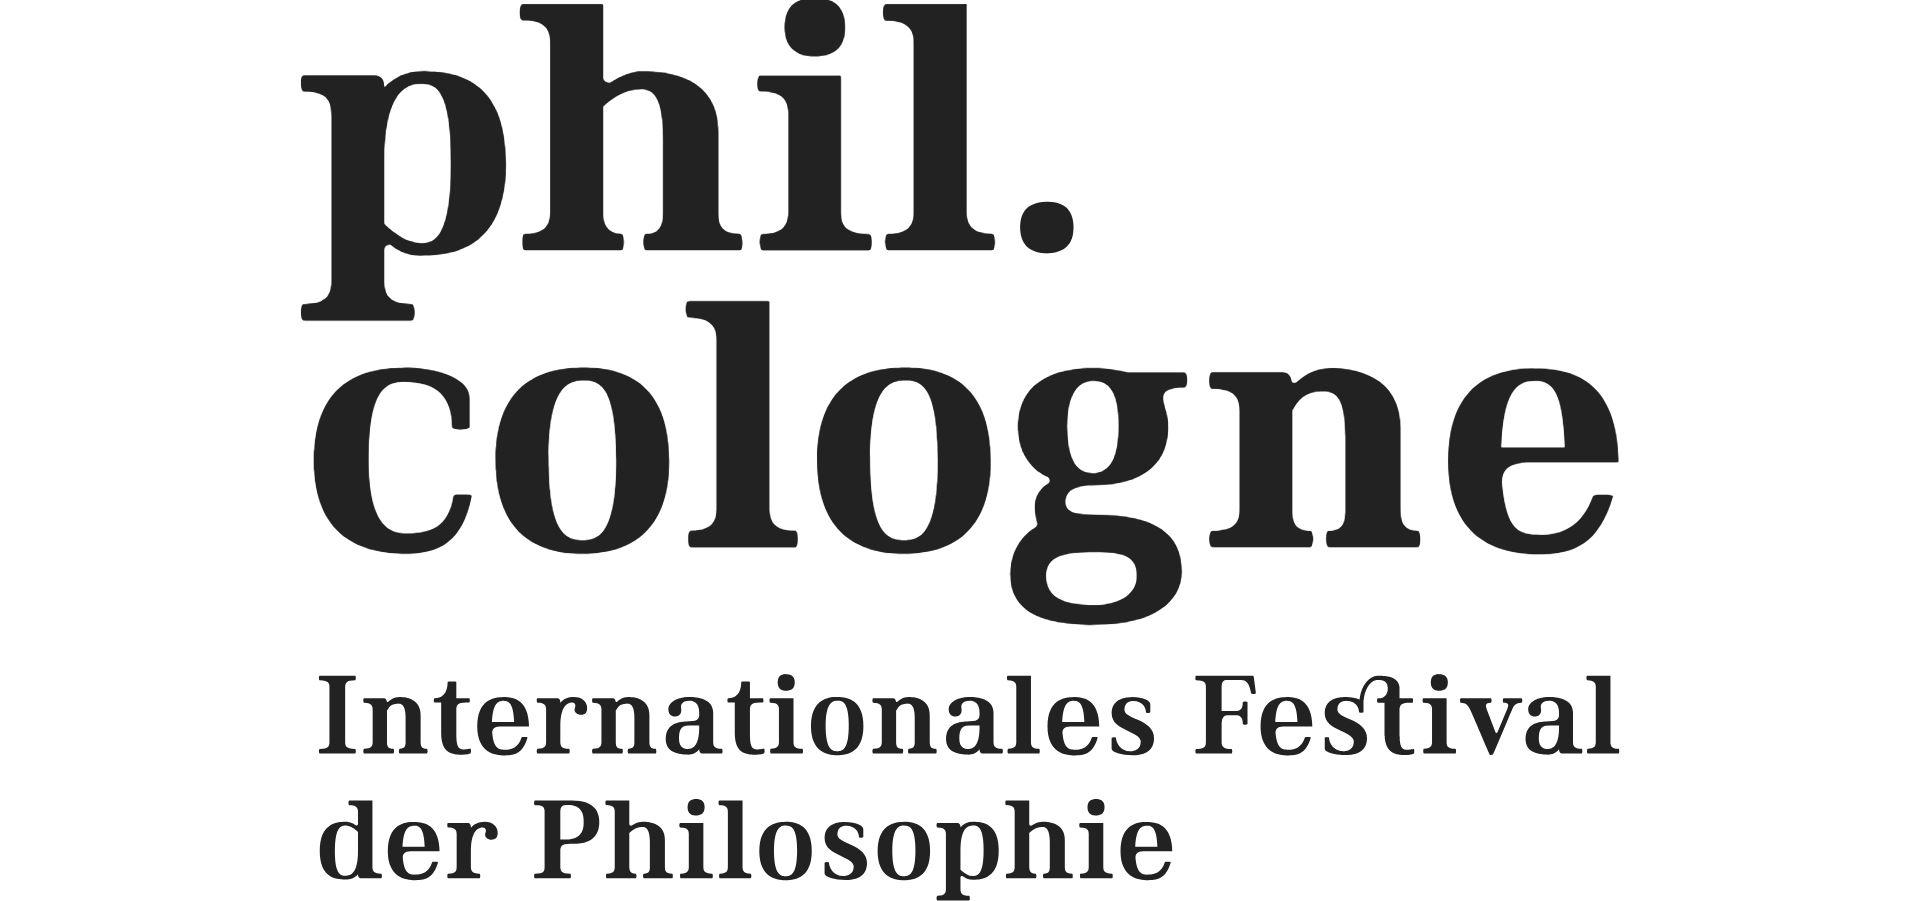 phil.cologne 2021